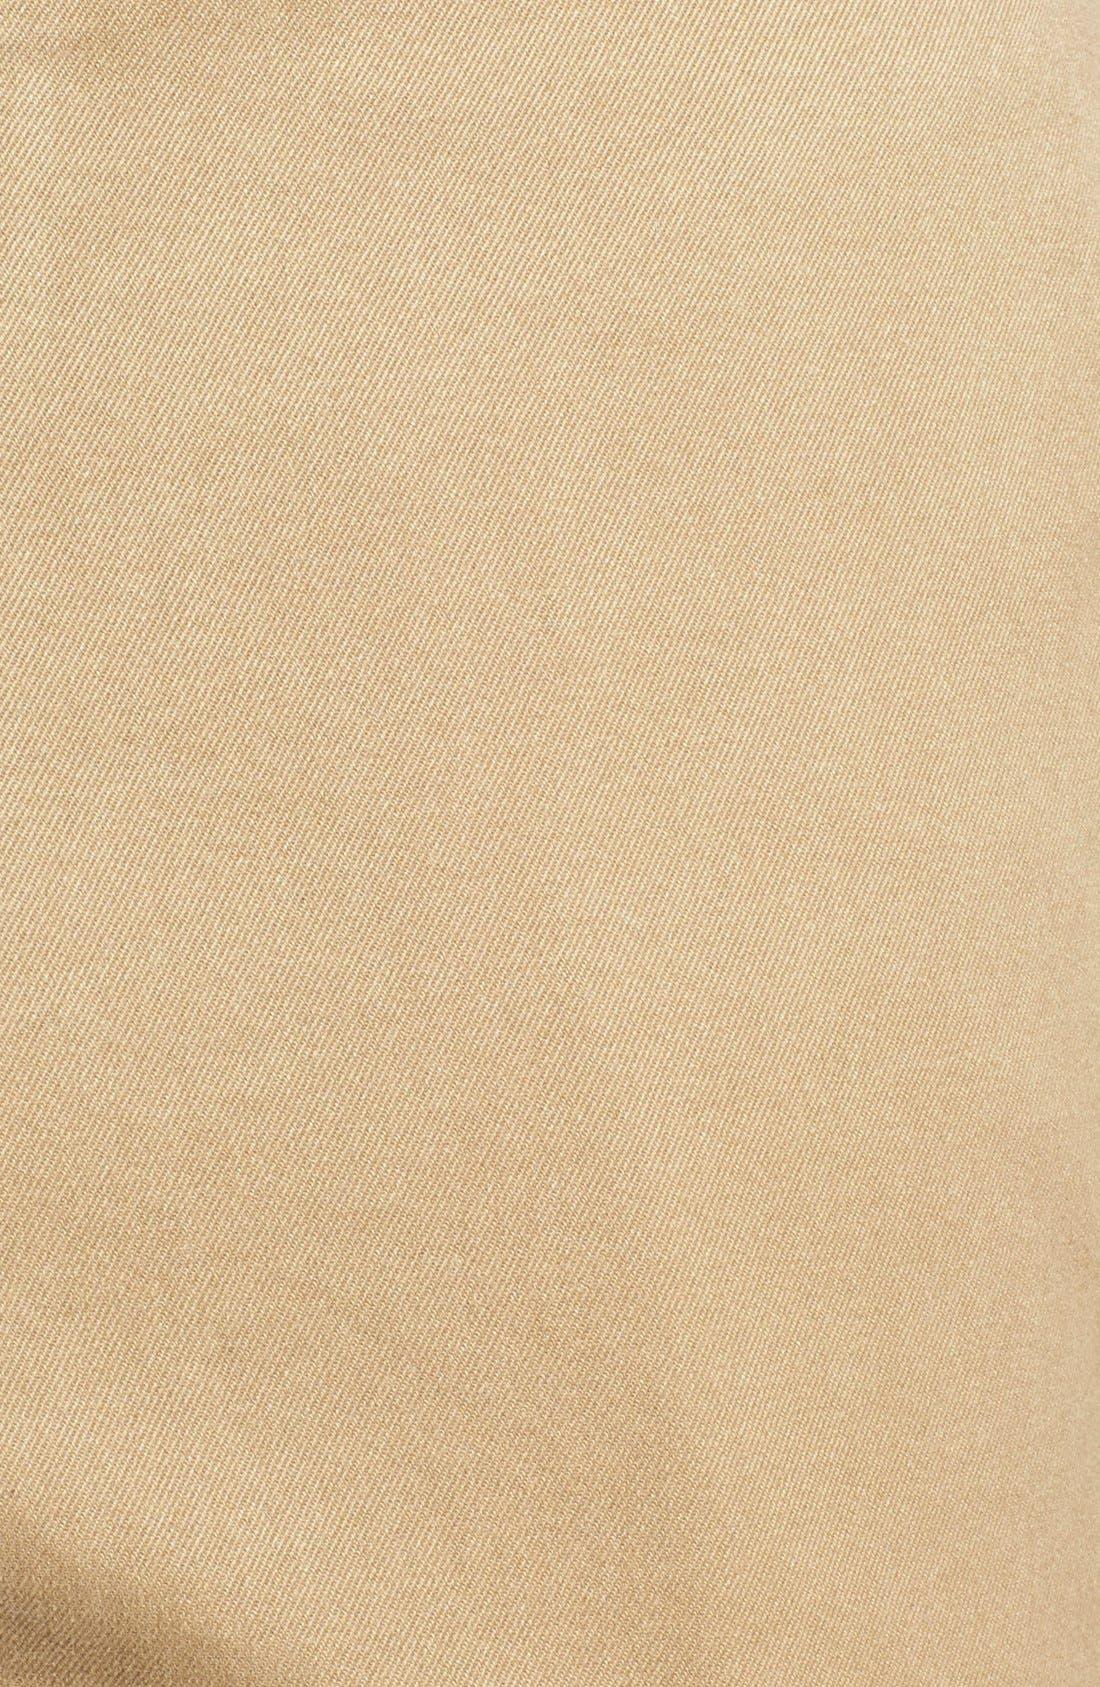 Garment Washed Twill Pants,                             Alternate thumbnail 3, color,                             British Tan